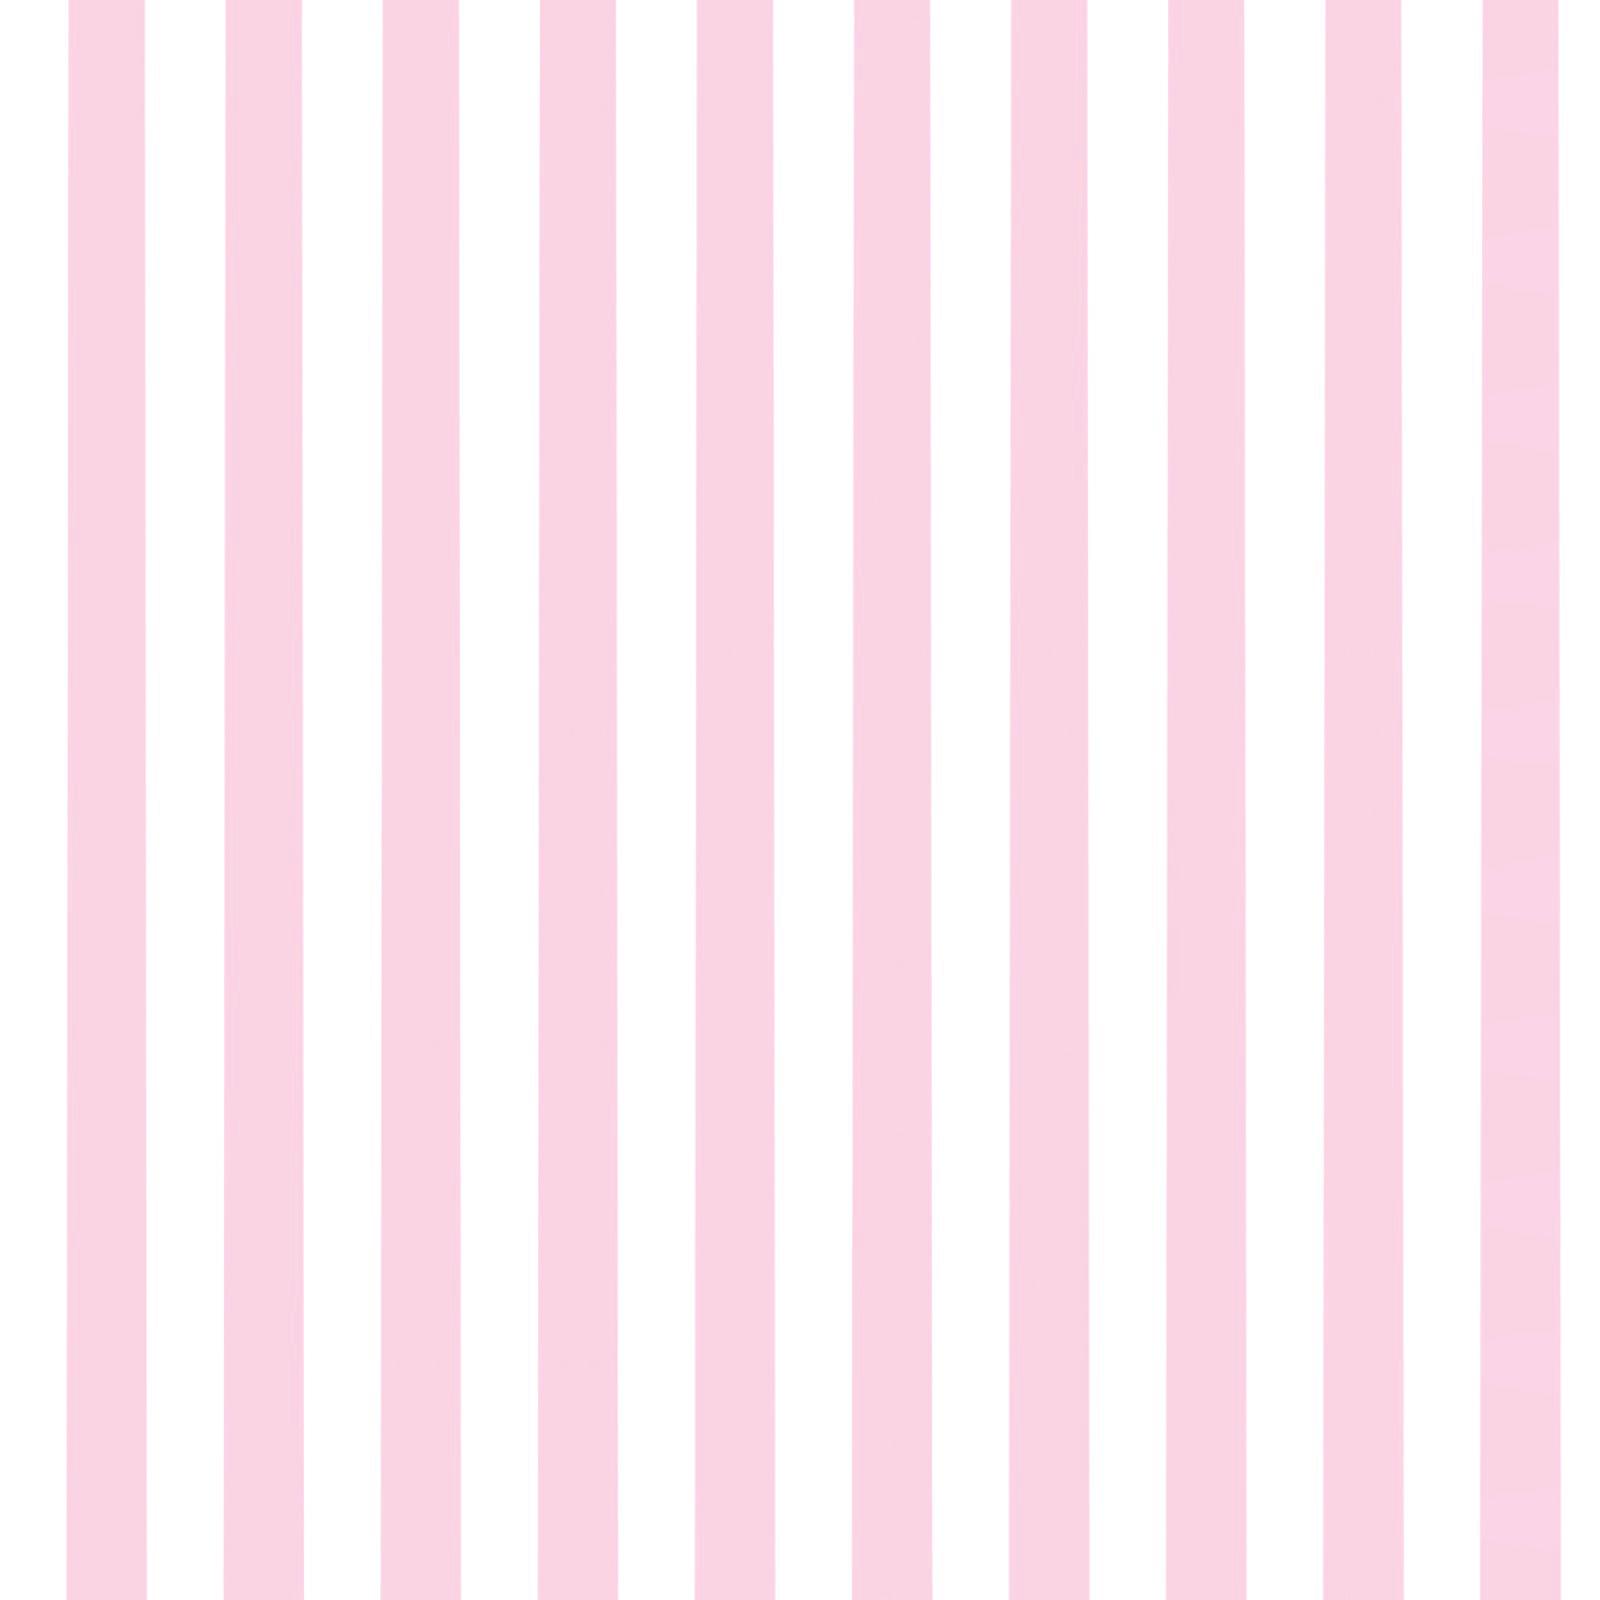 Pin Light-pink-striped-wallpaper on Pinterest